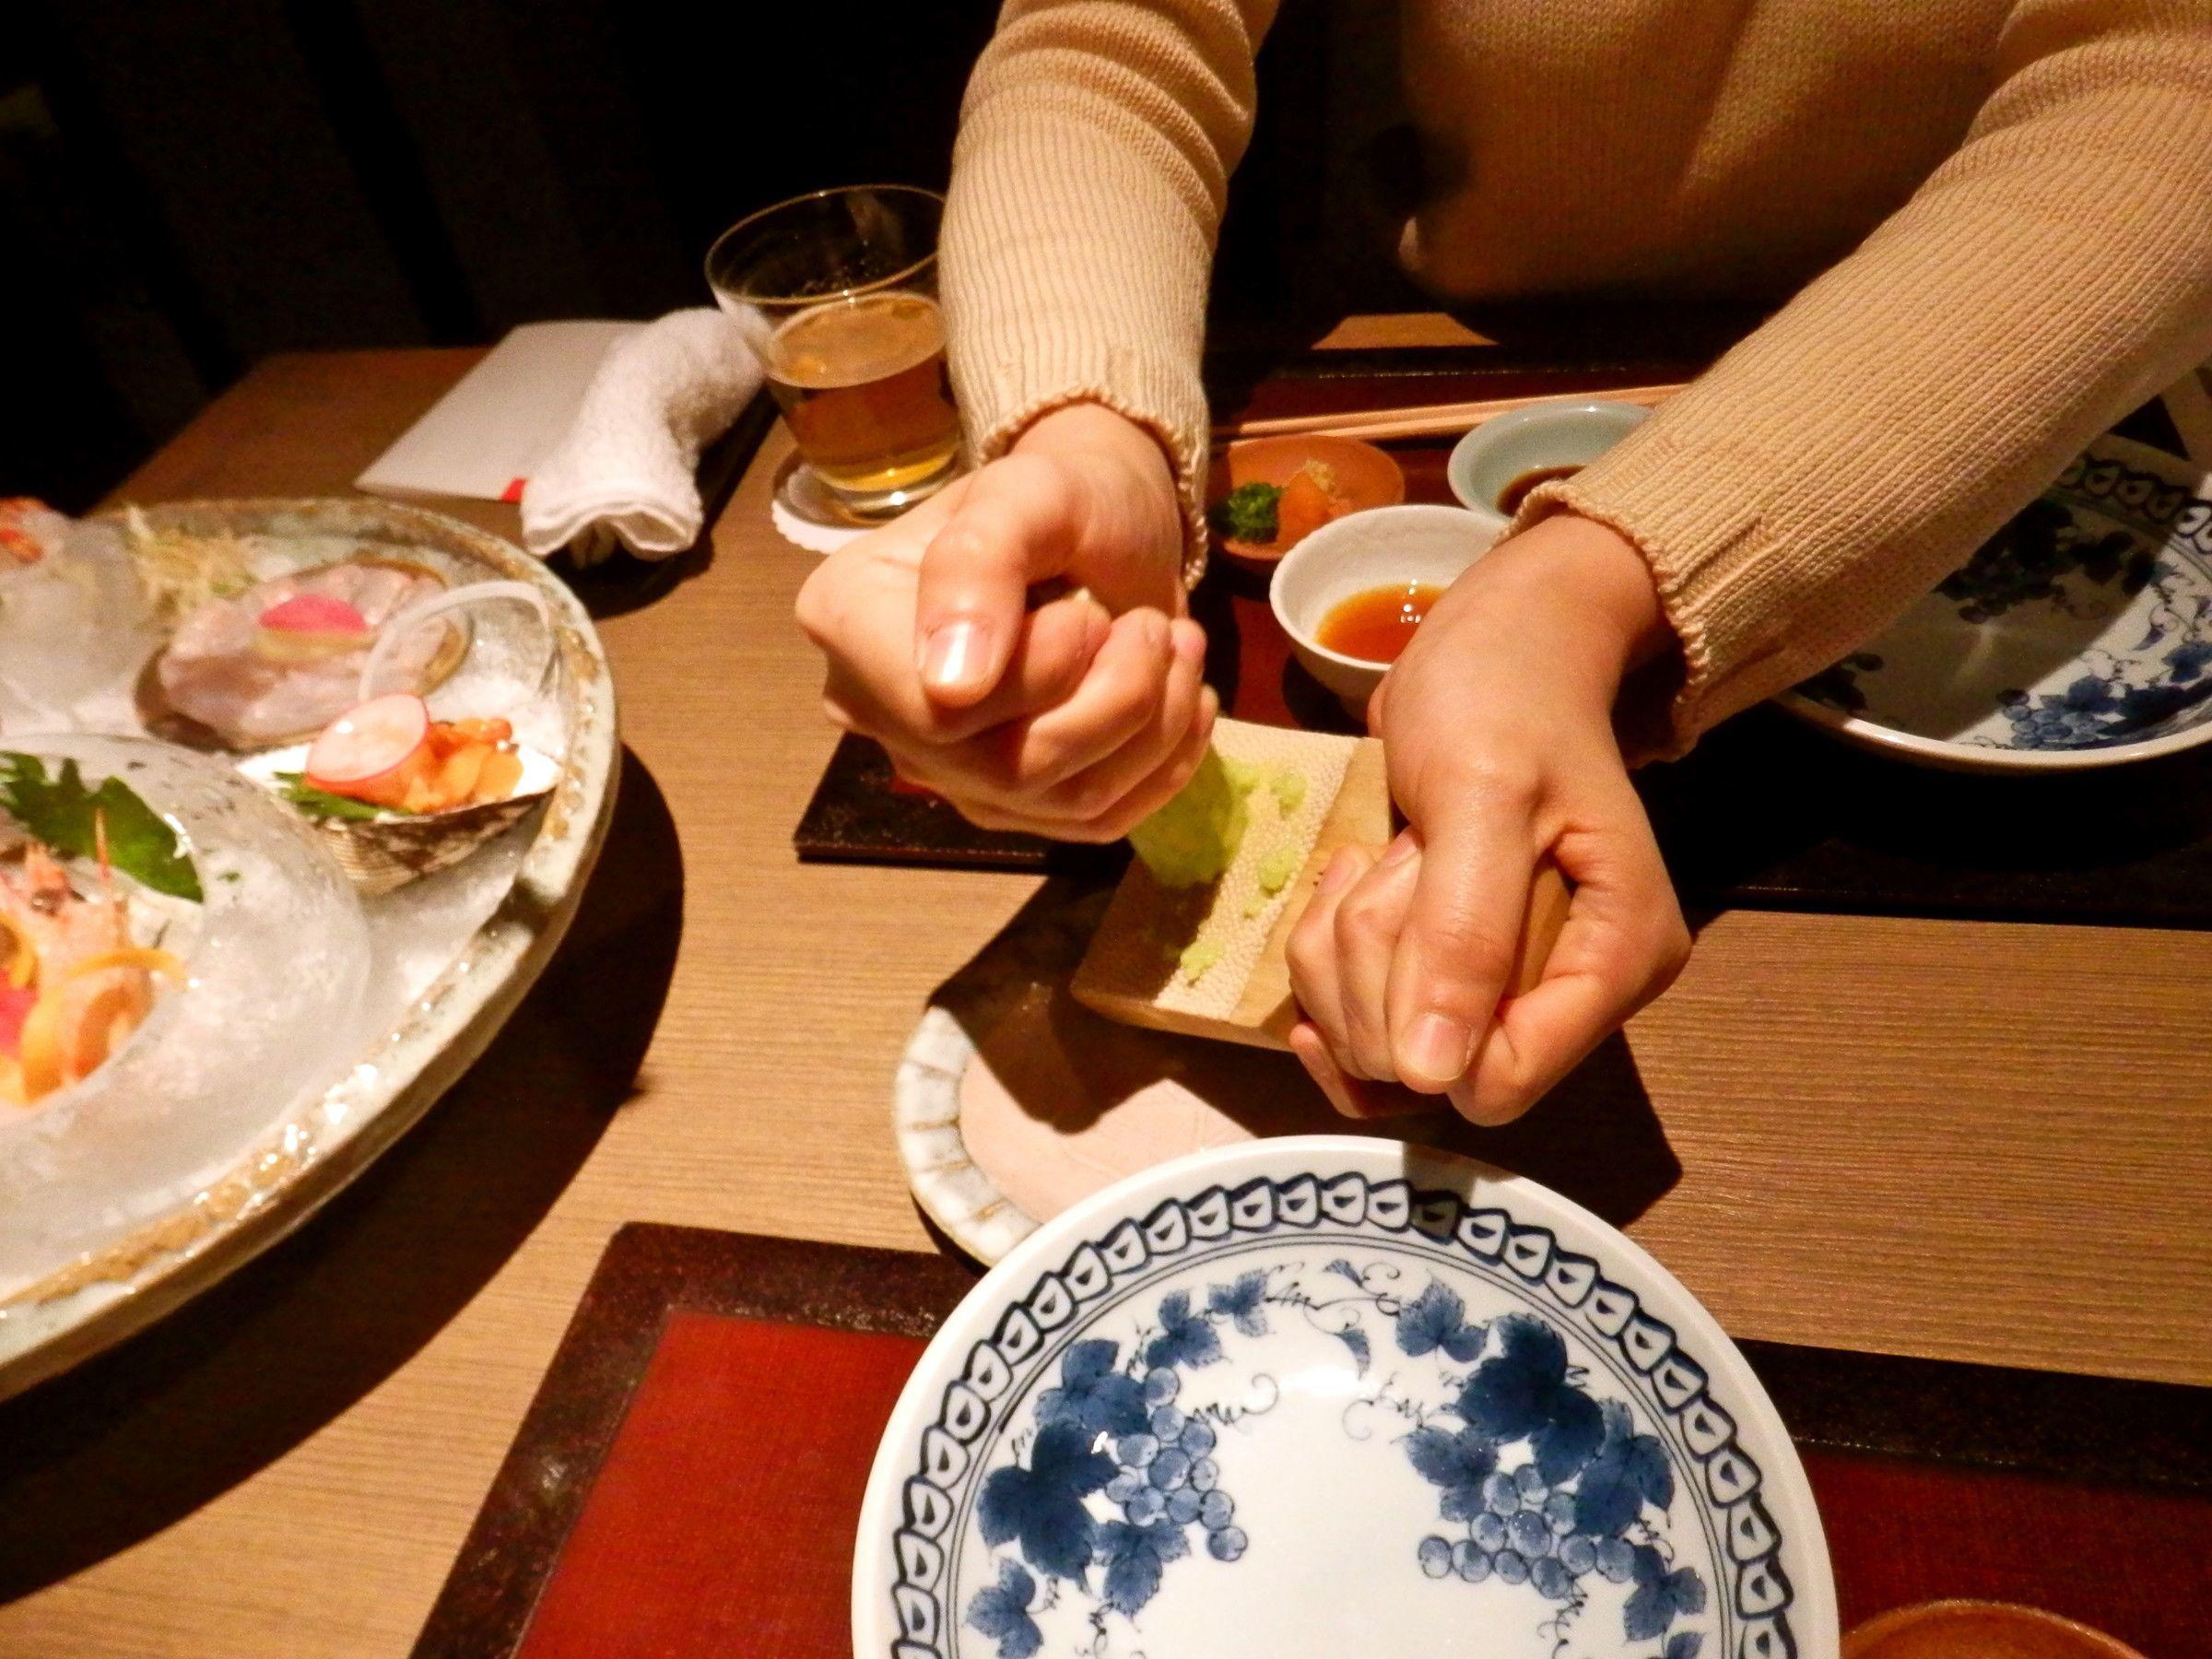 Nakamura-san grates some fresh wasabi